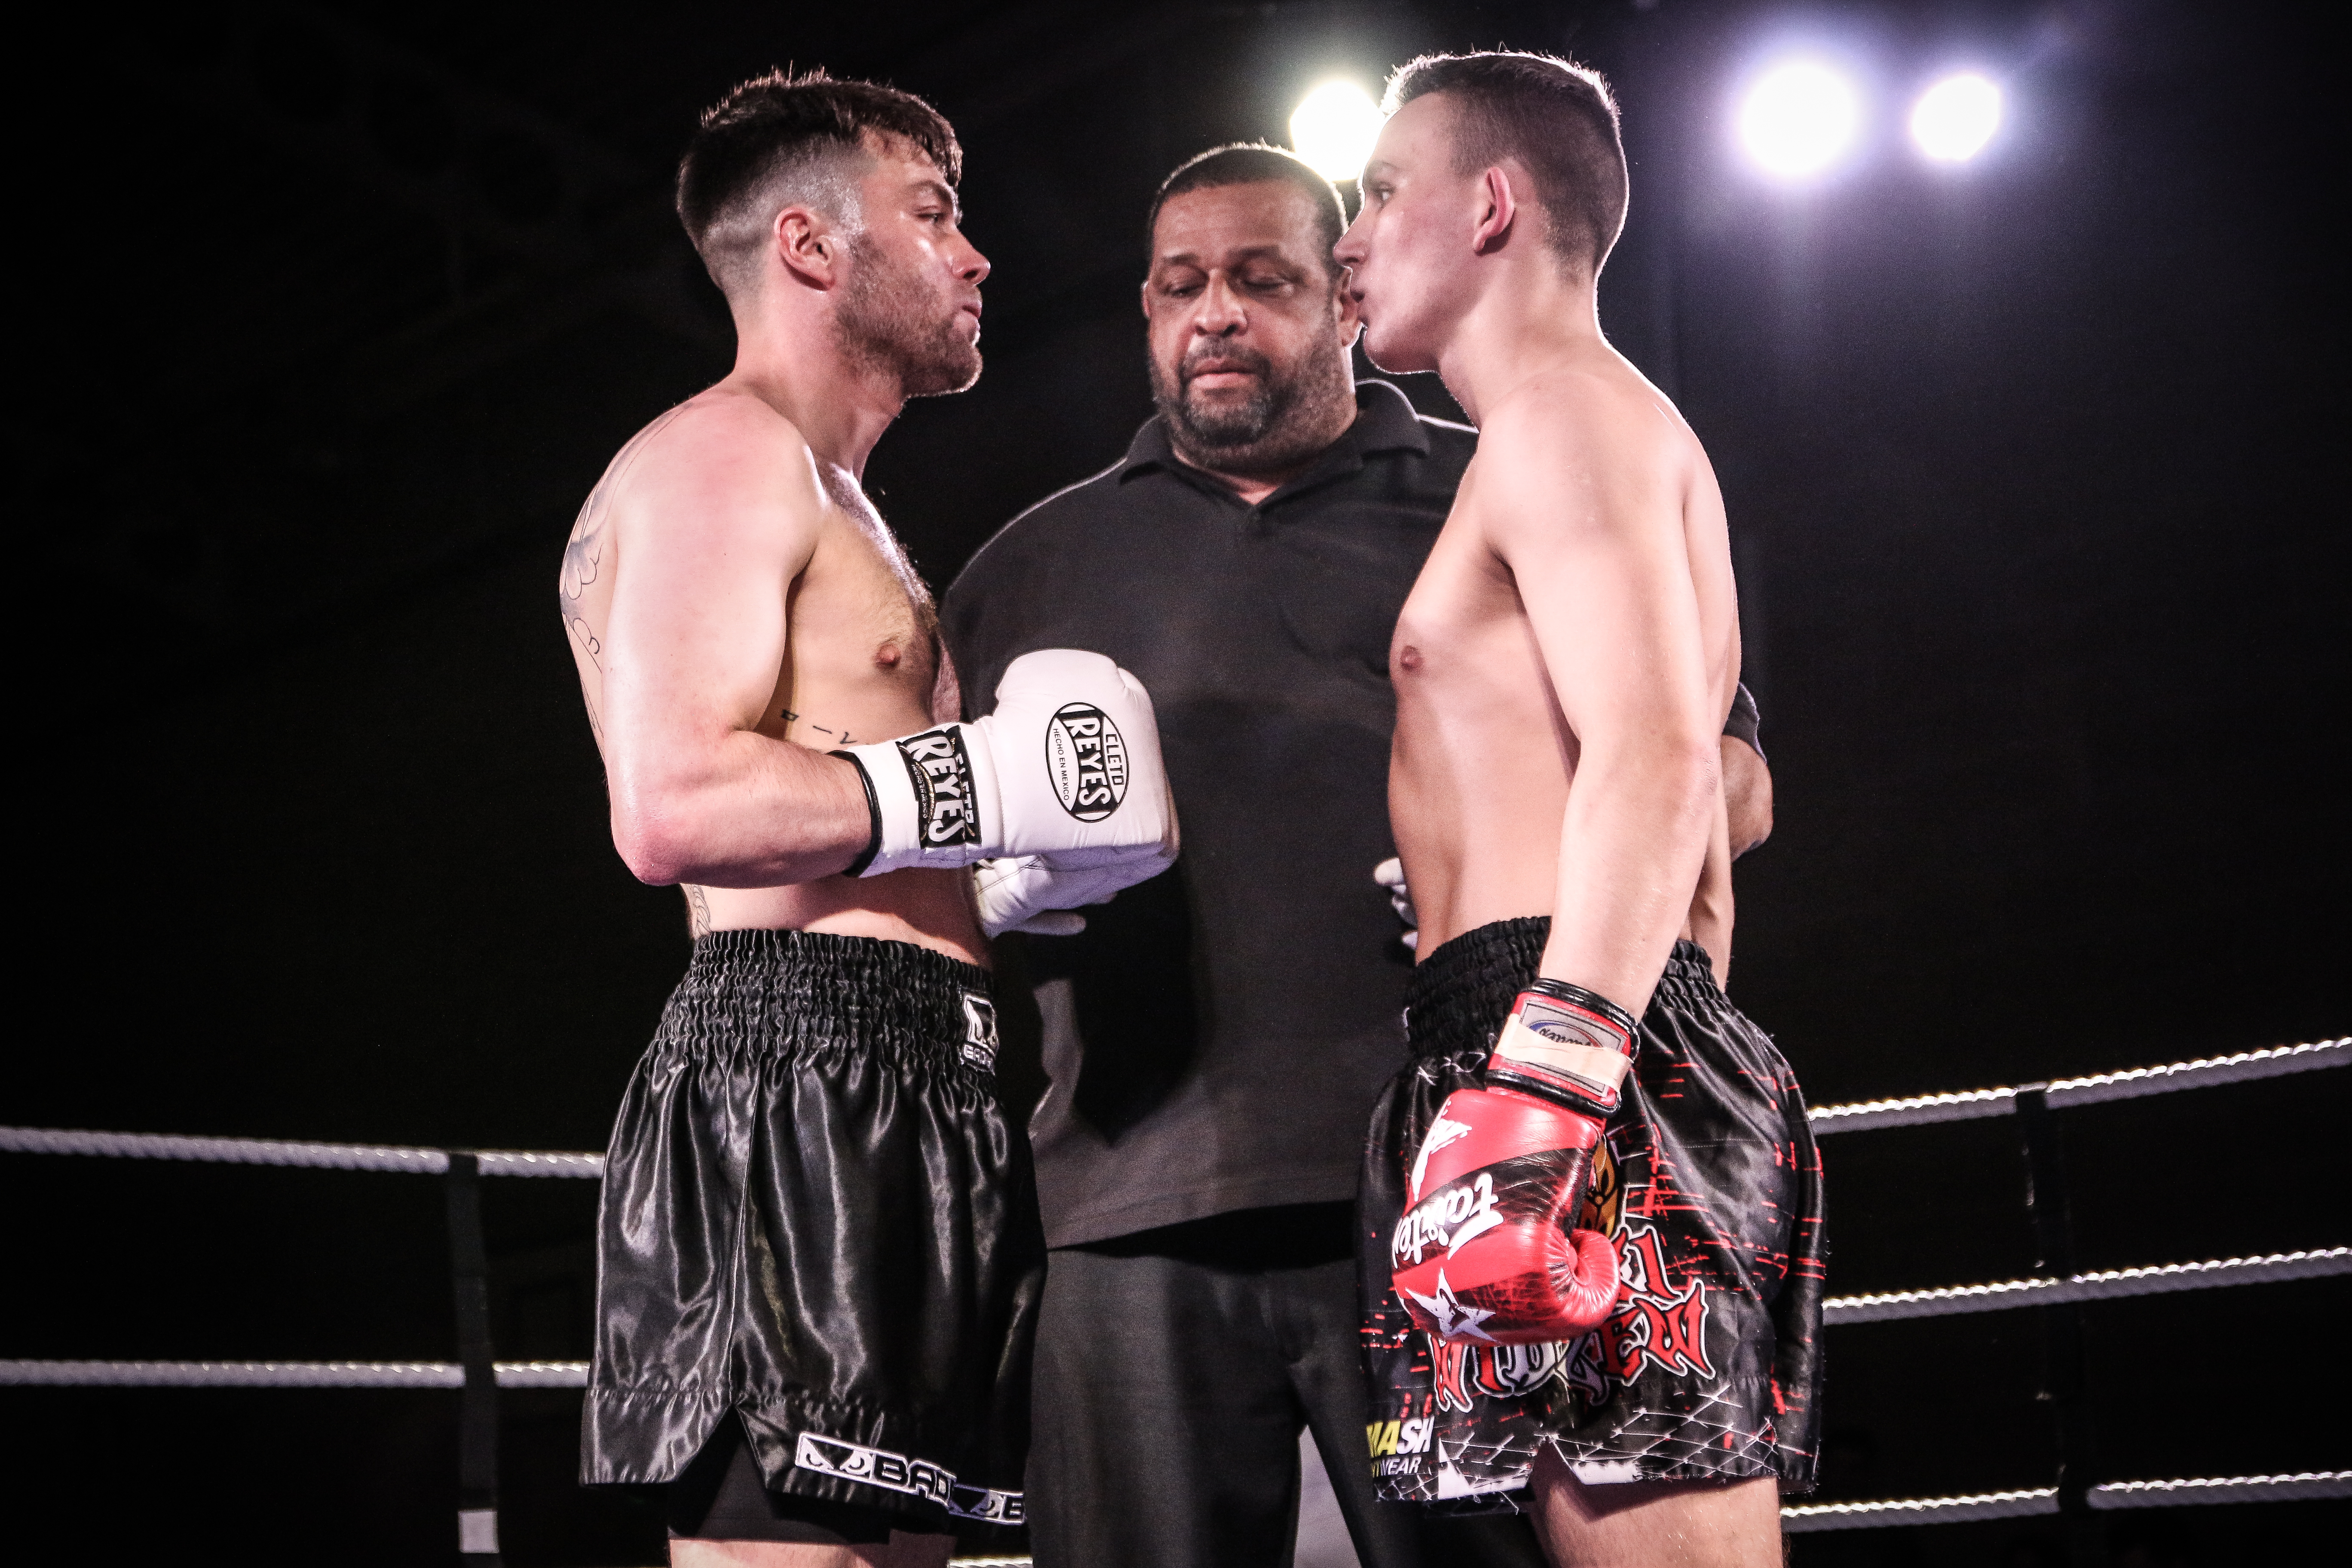 Dave Patterson vs Maciej Wasiuk